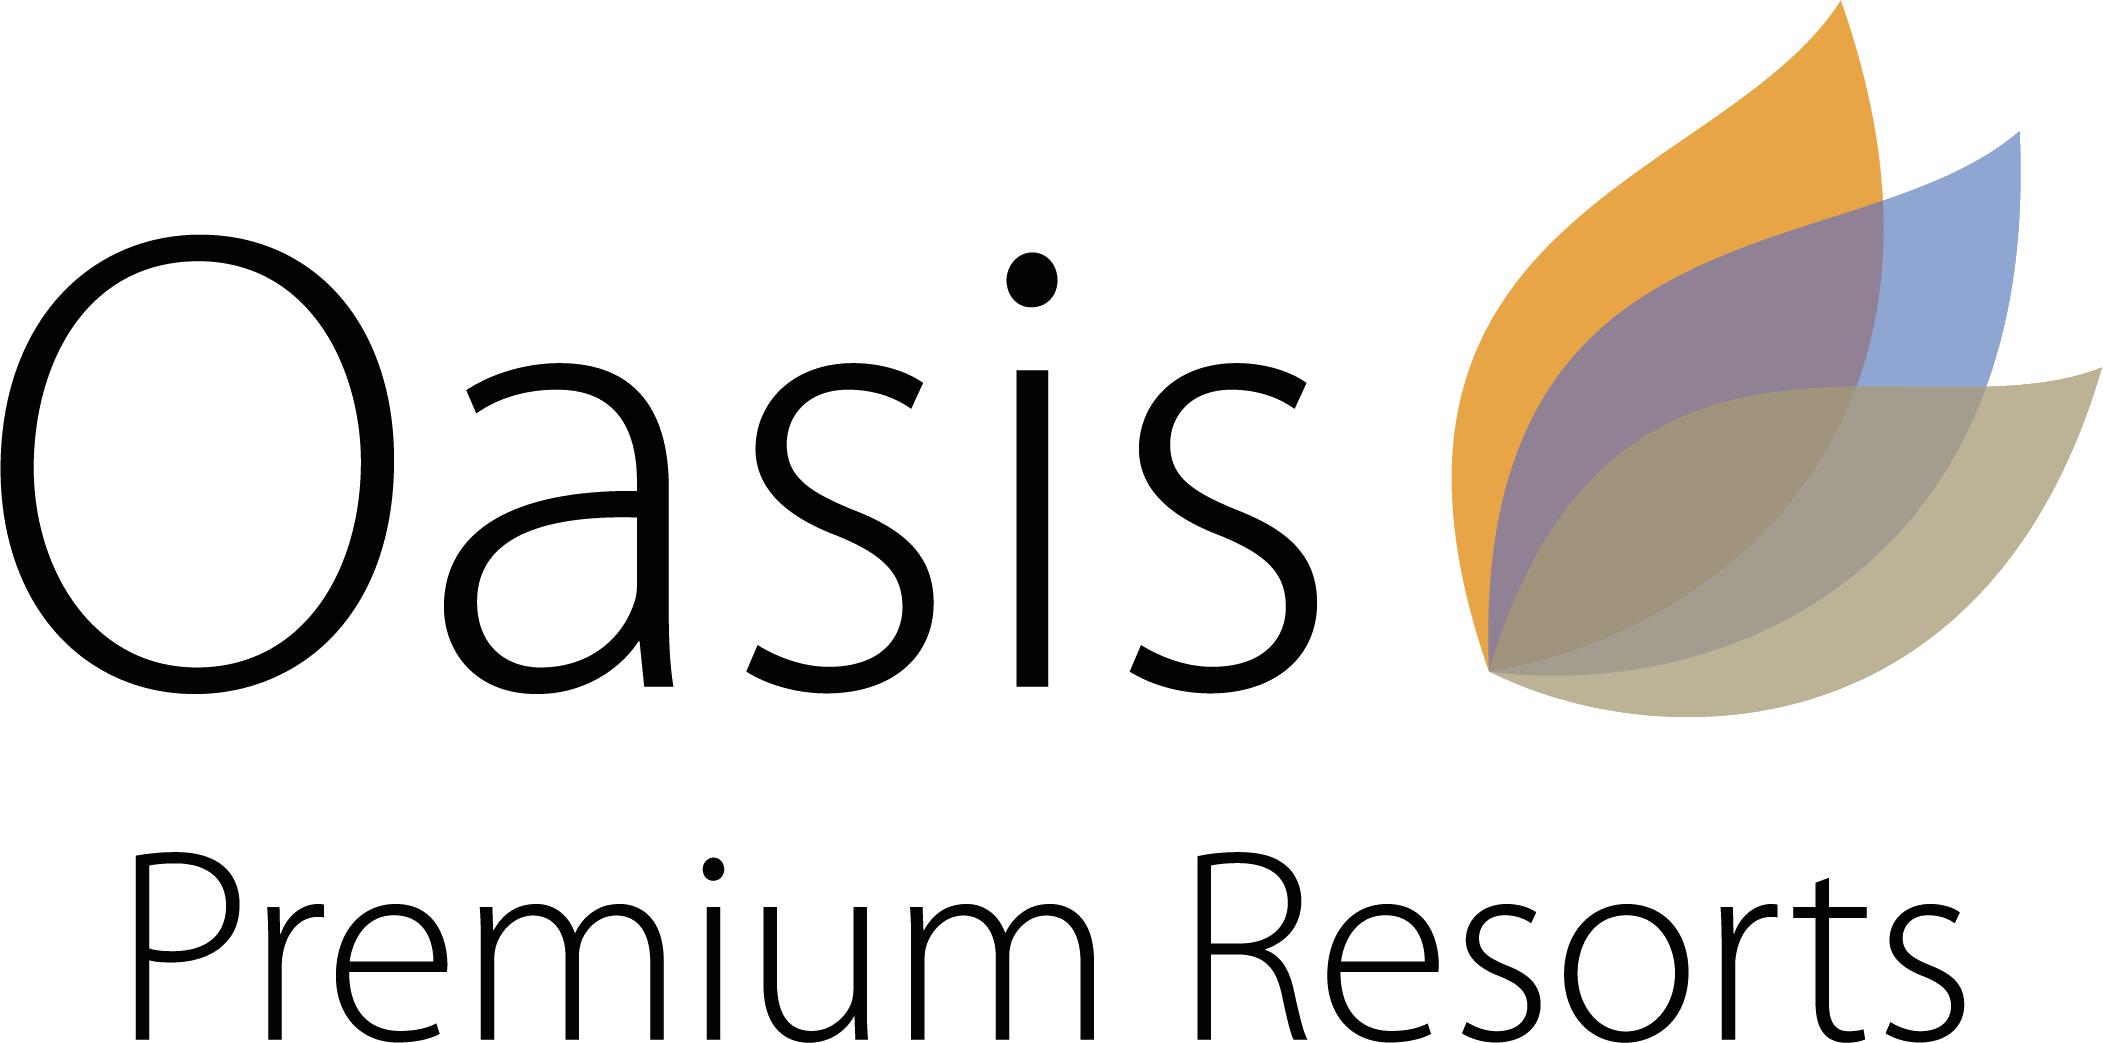 Oasis Premium Resorts